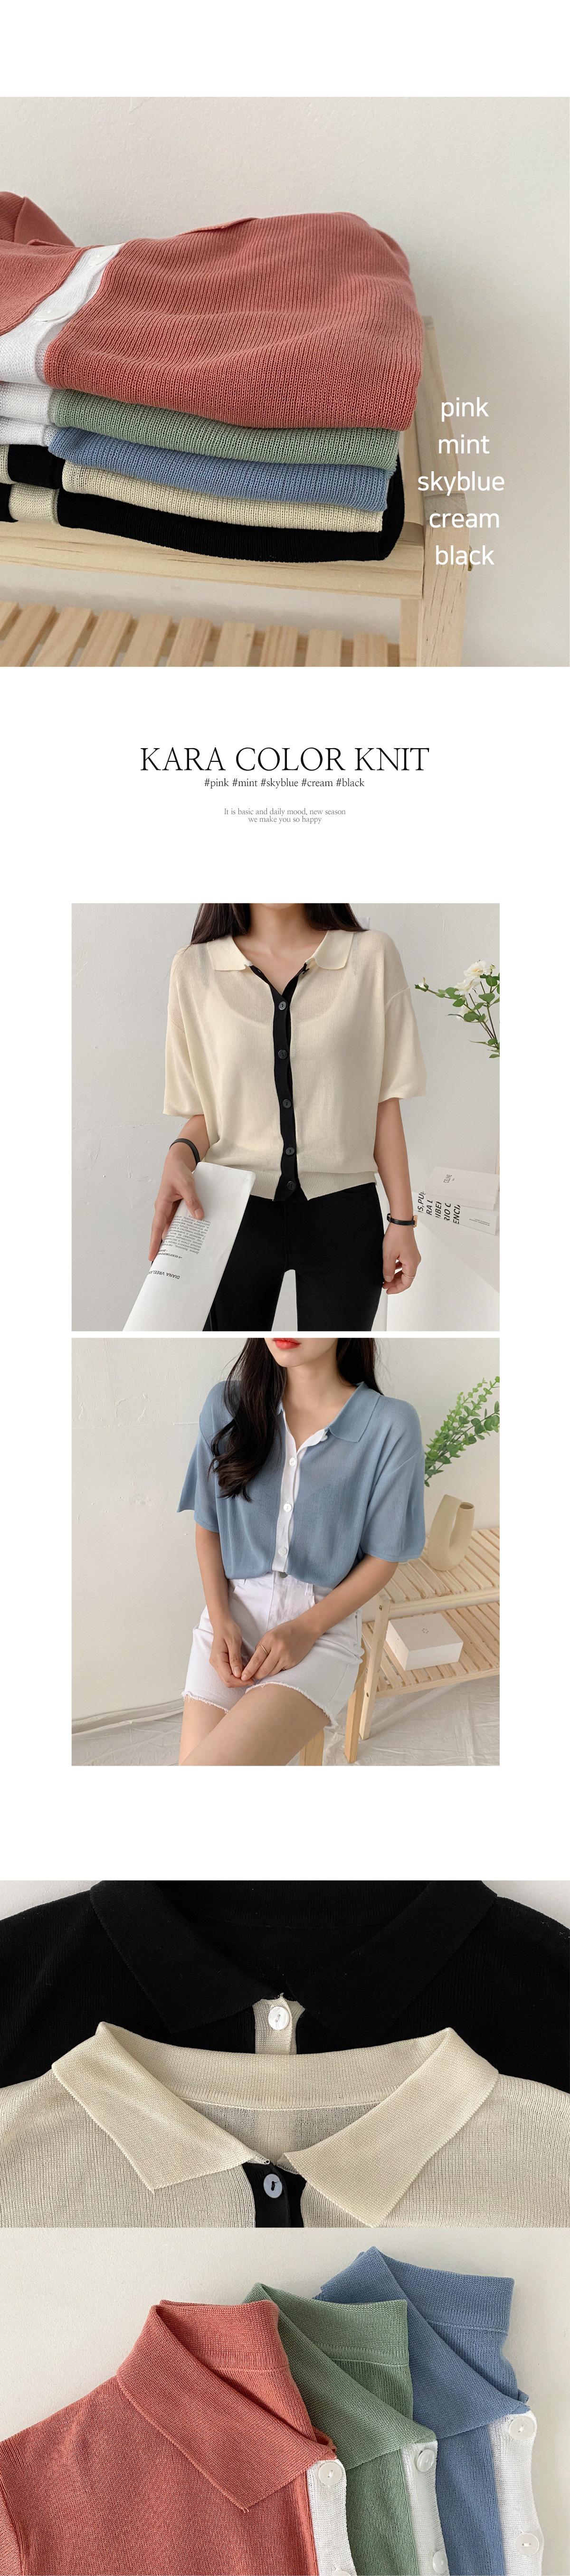 Week color collar cardigan